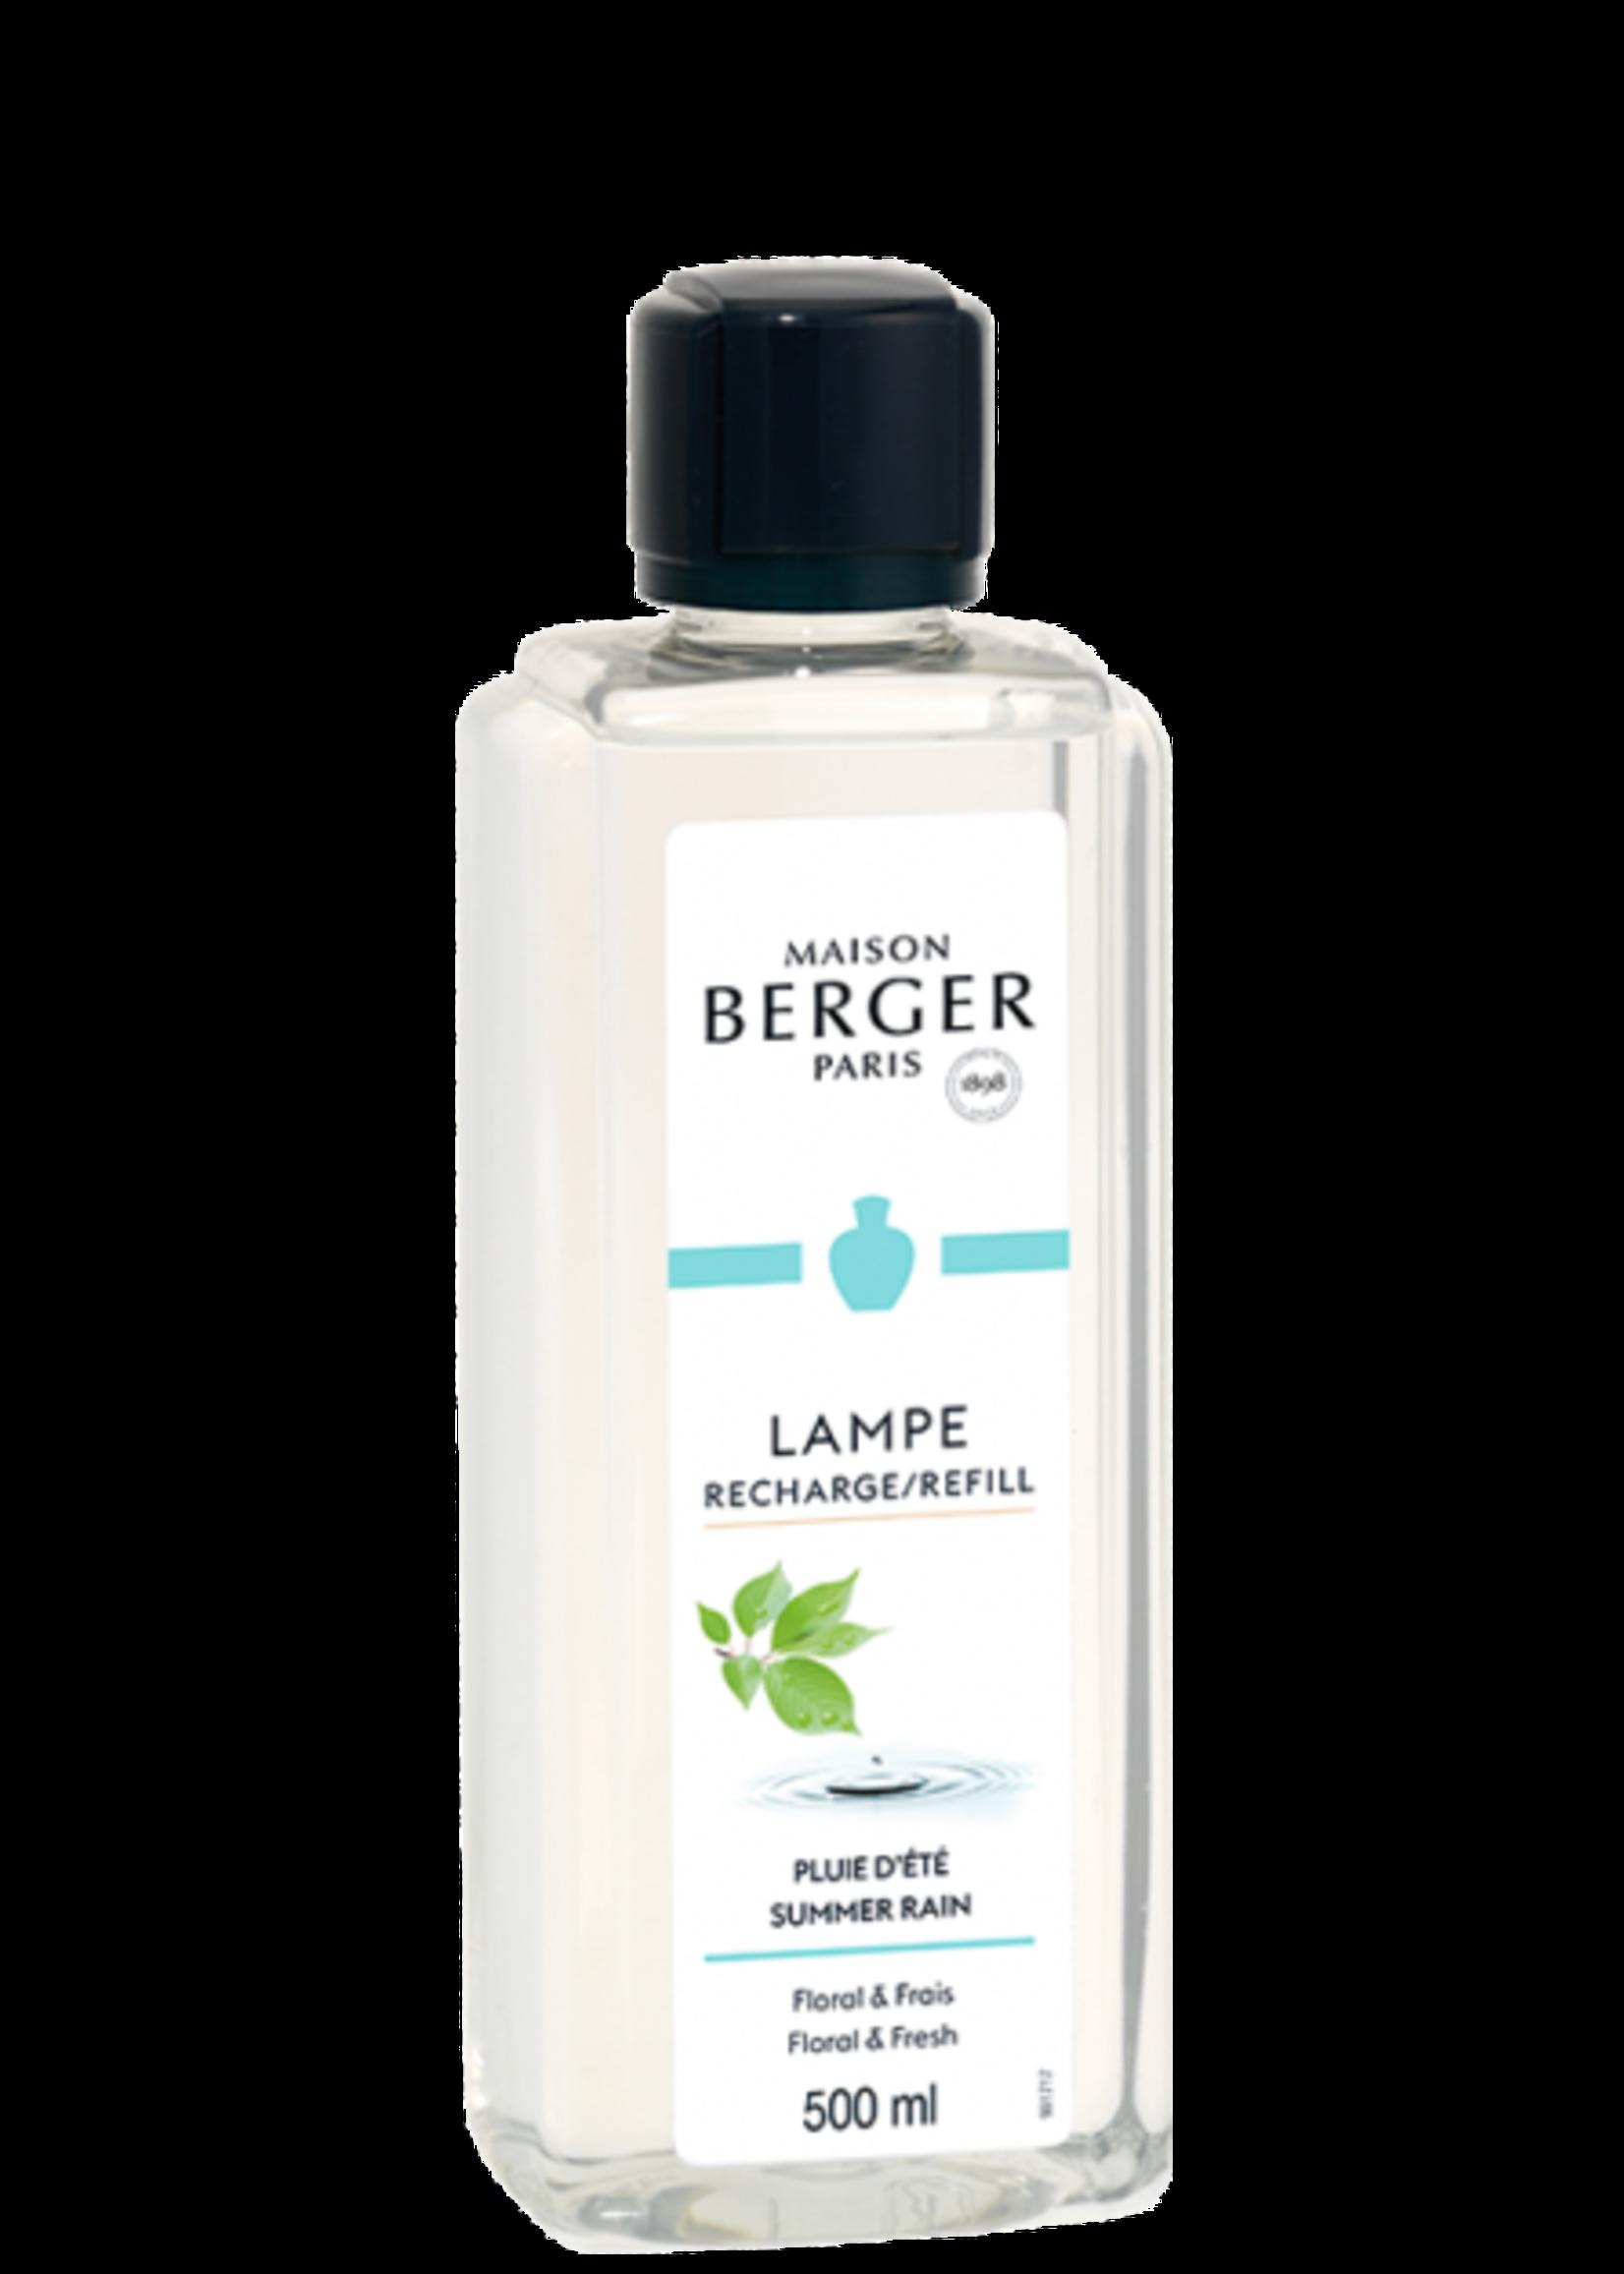 Lampe Berger Huisparfum Summer Rain